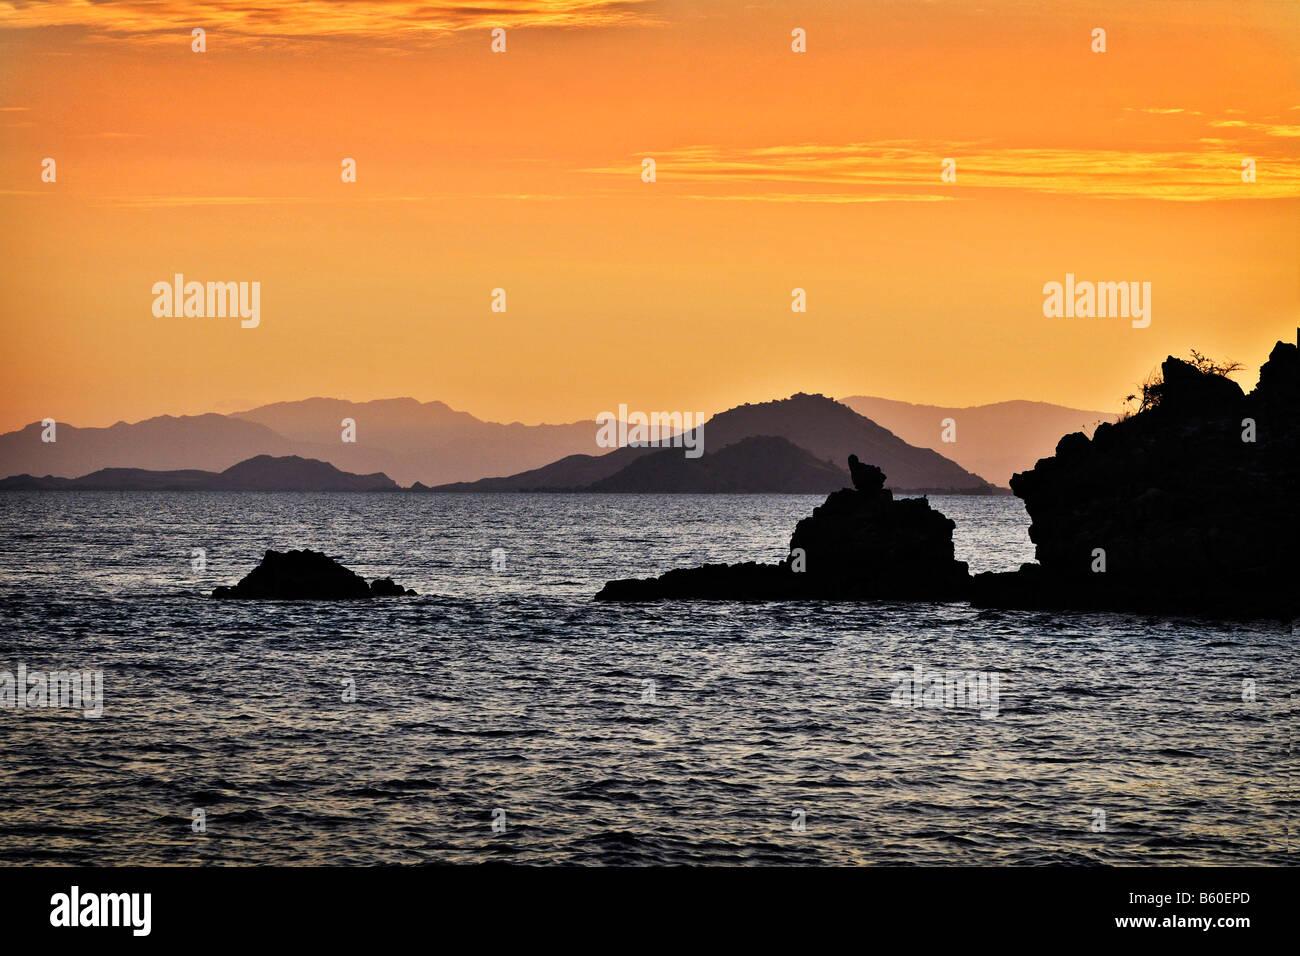 One of many islands, Komodo National Park, World Heritage Site, Komodo, Indonesia, Asia - Stock Image